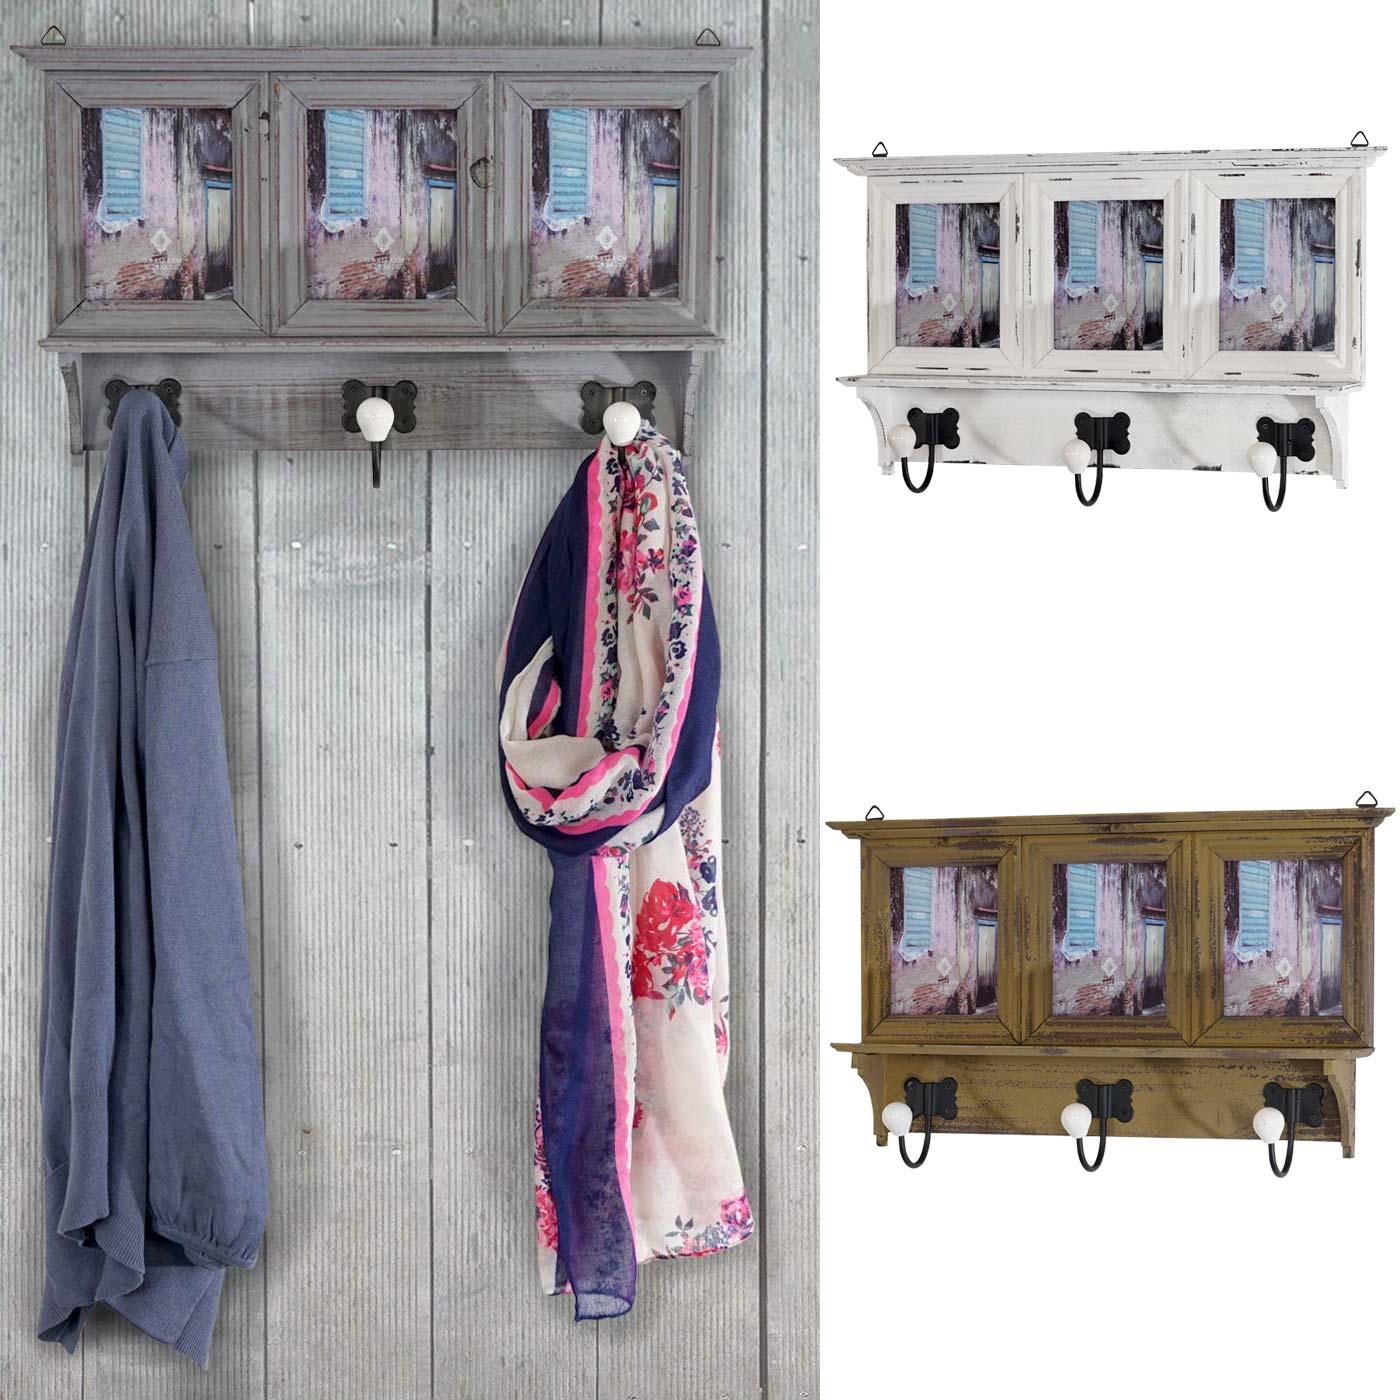 garderobe halifax wandgarderobe mit bilderrahmen 35x56x9cm shabby look vintage. Black Bedroom Furniture Sets. Home Design Ideas